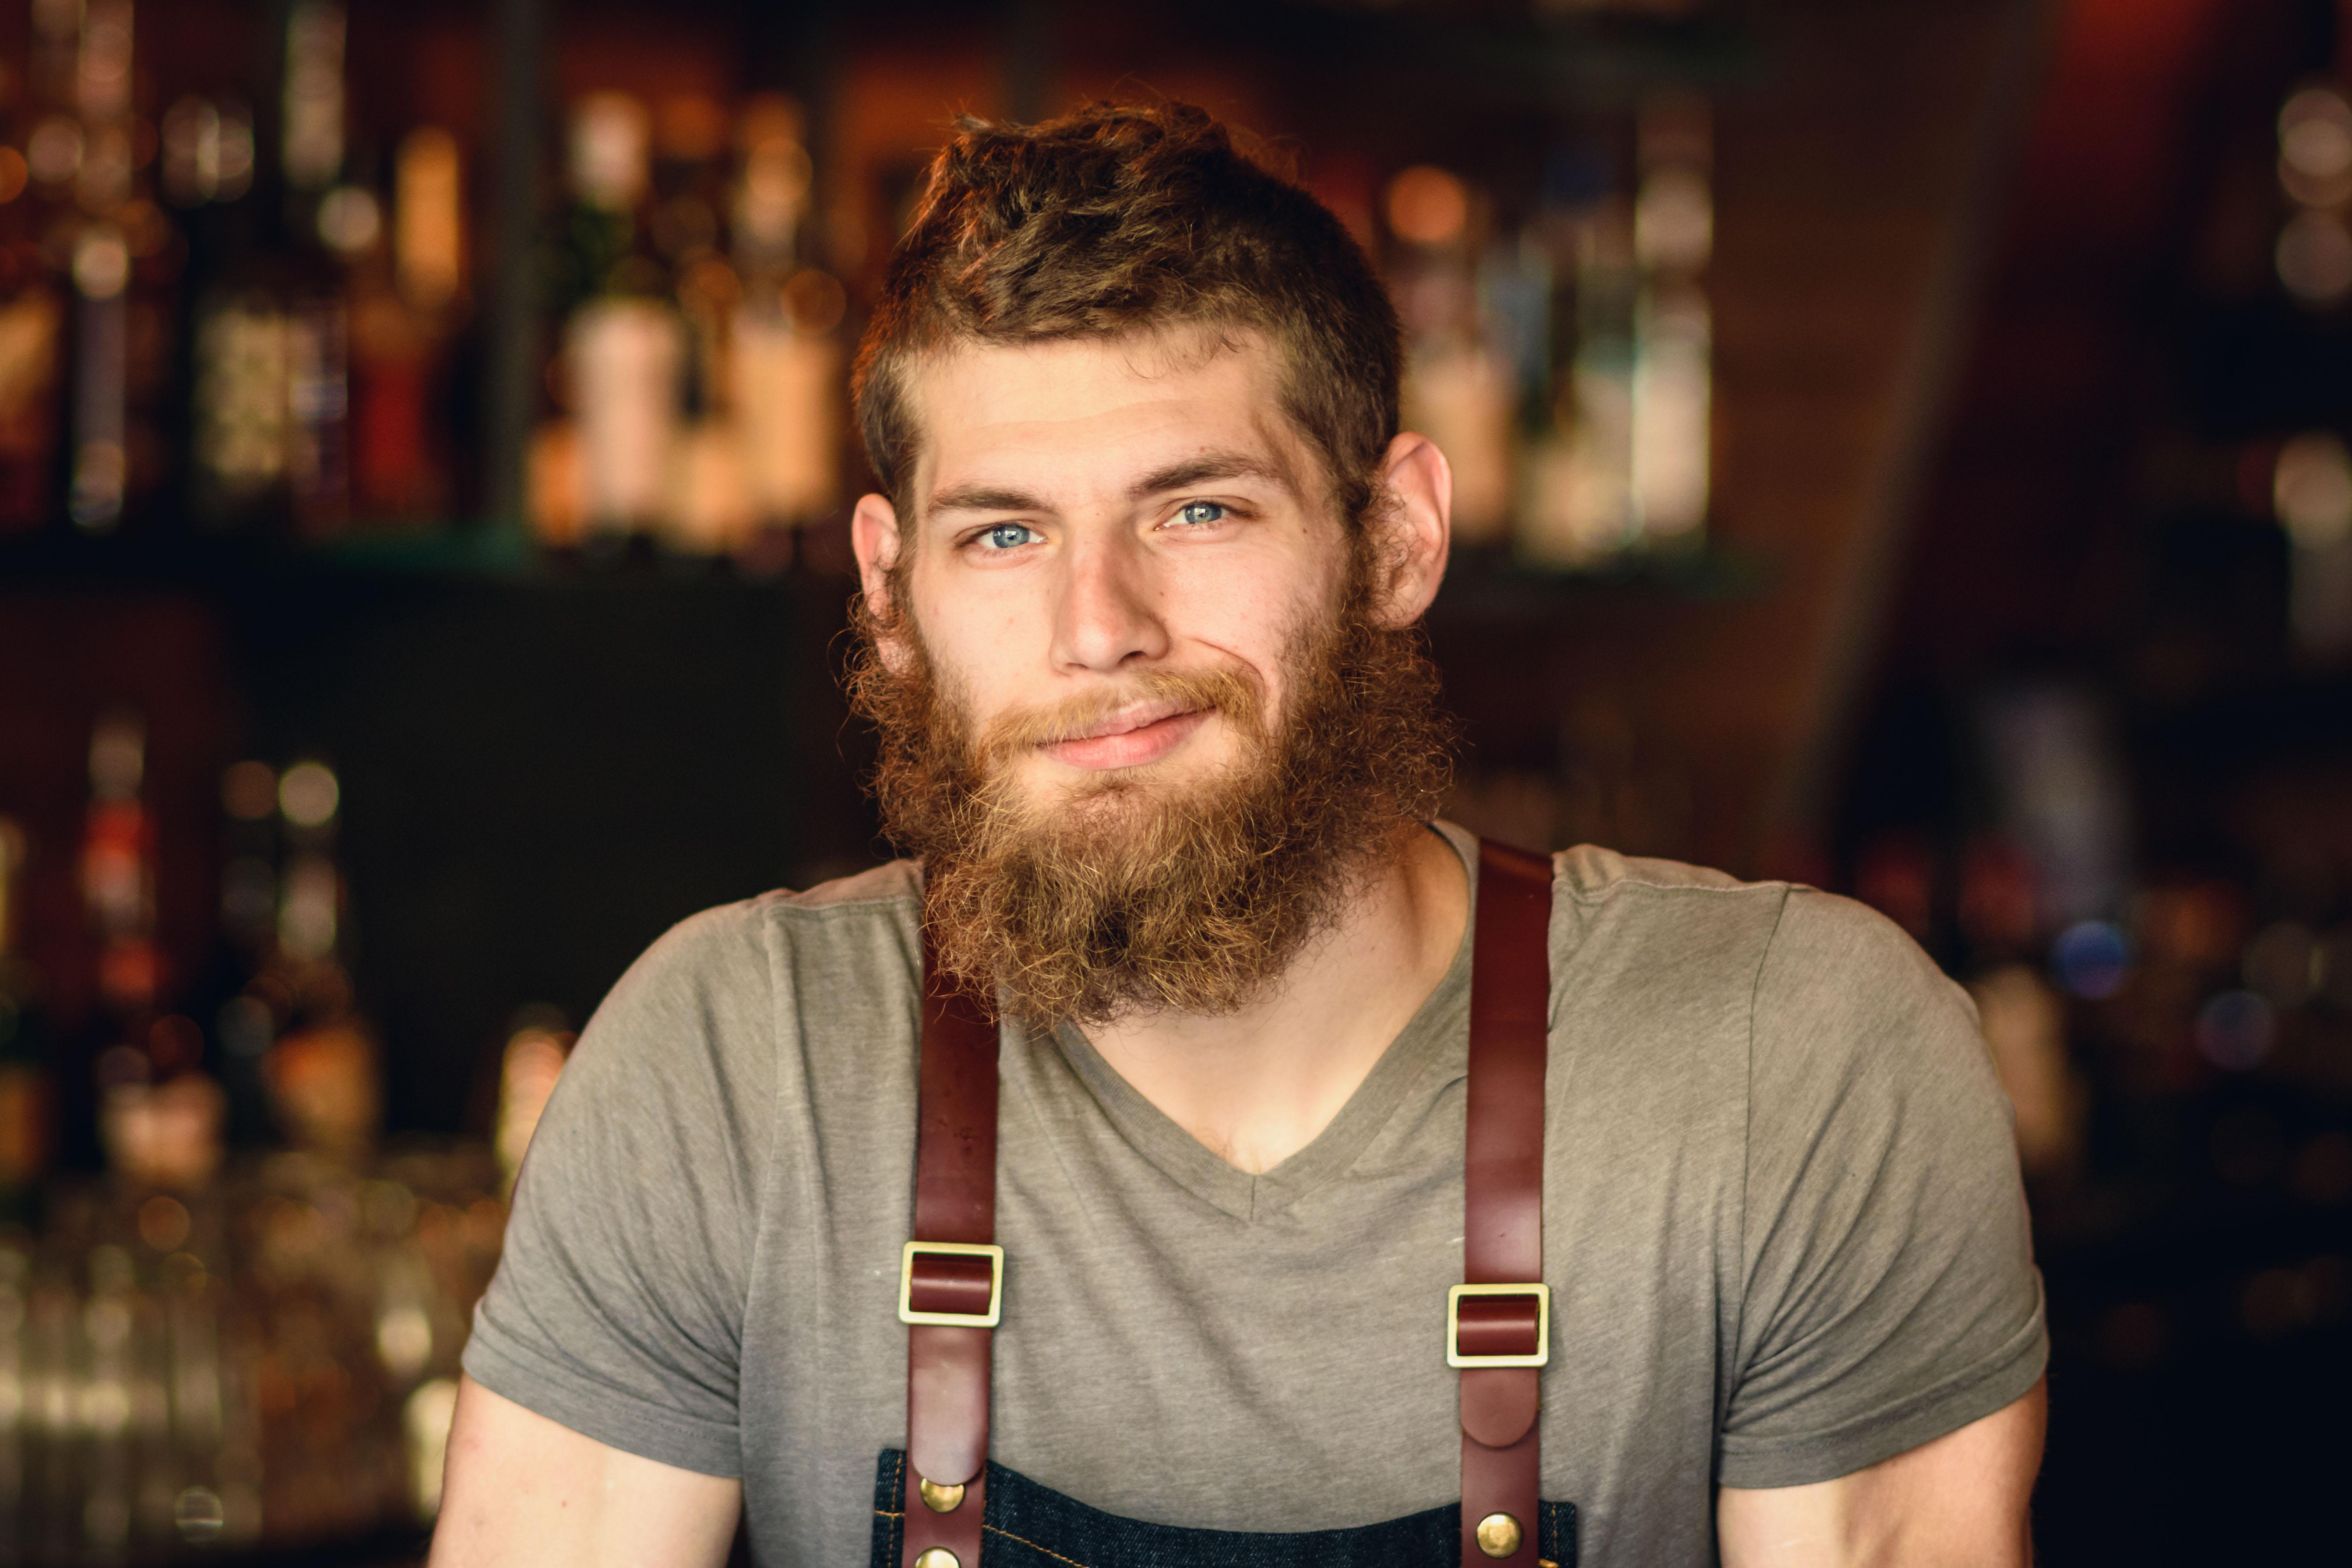 bay area corporate photographer photography redwood city san jose bartender portrait headshot creative candid